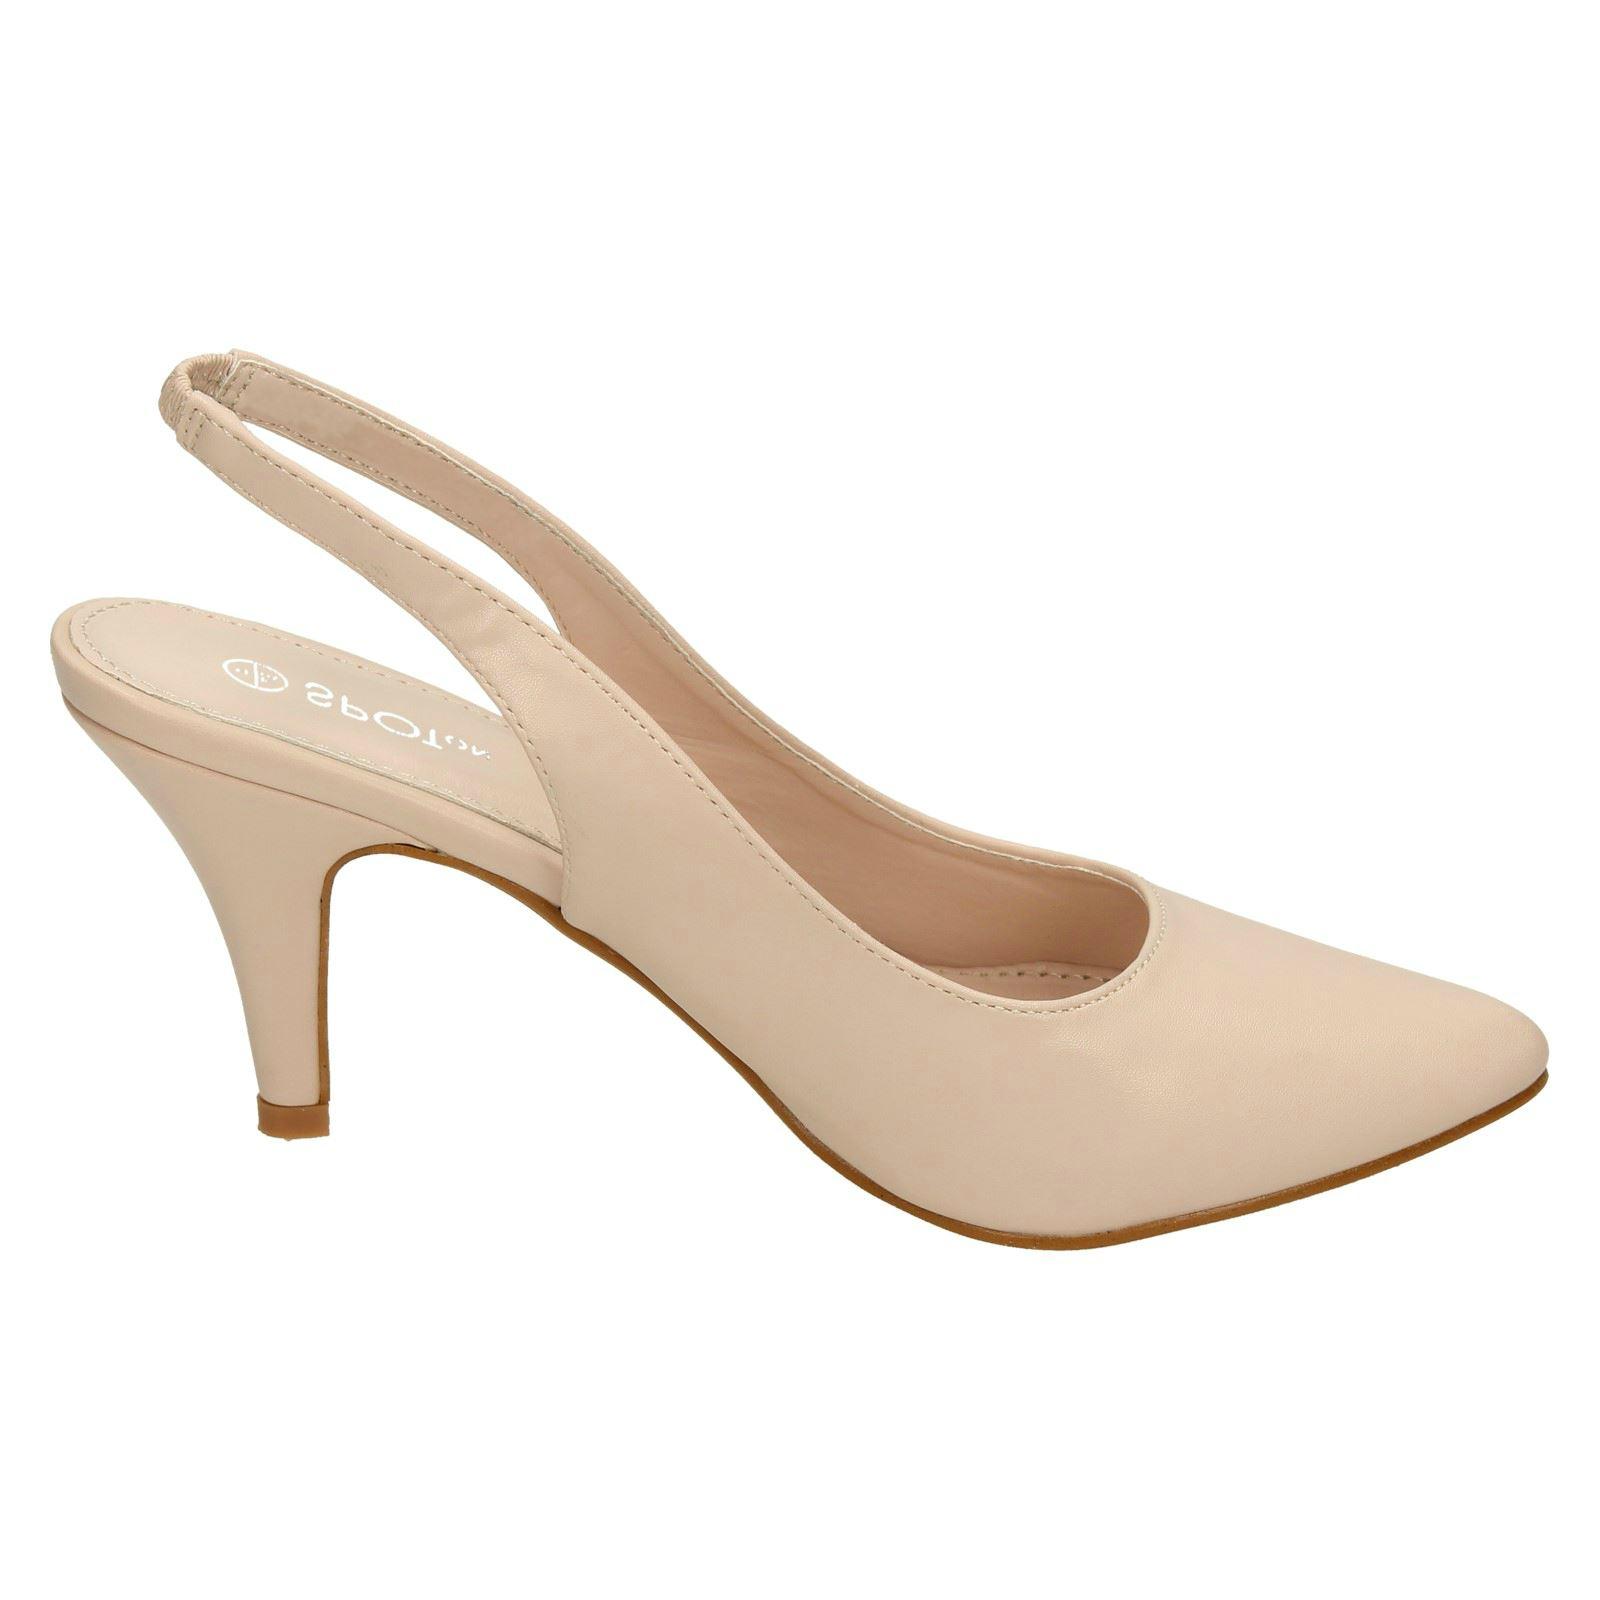 Navy Sling Back Court Shoes Mid Heel Uk